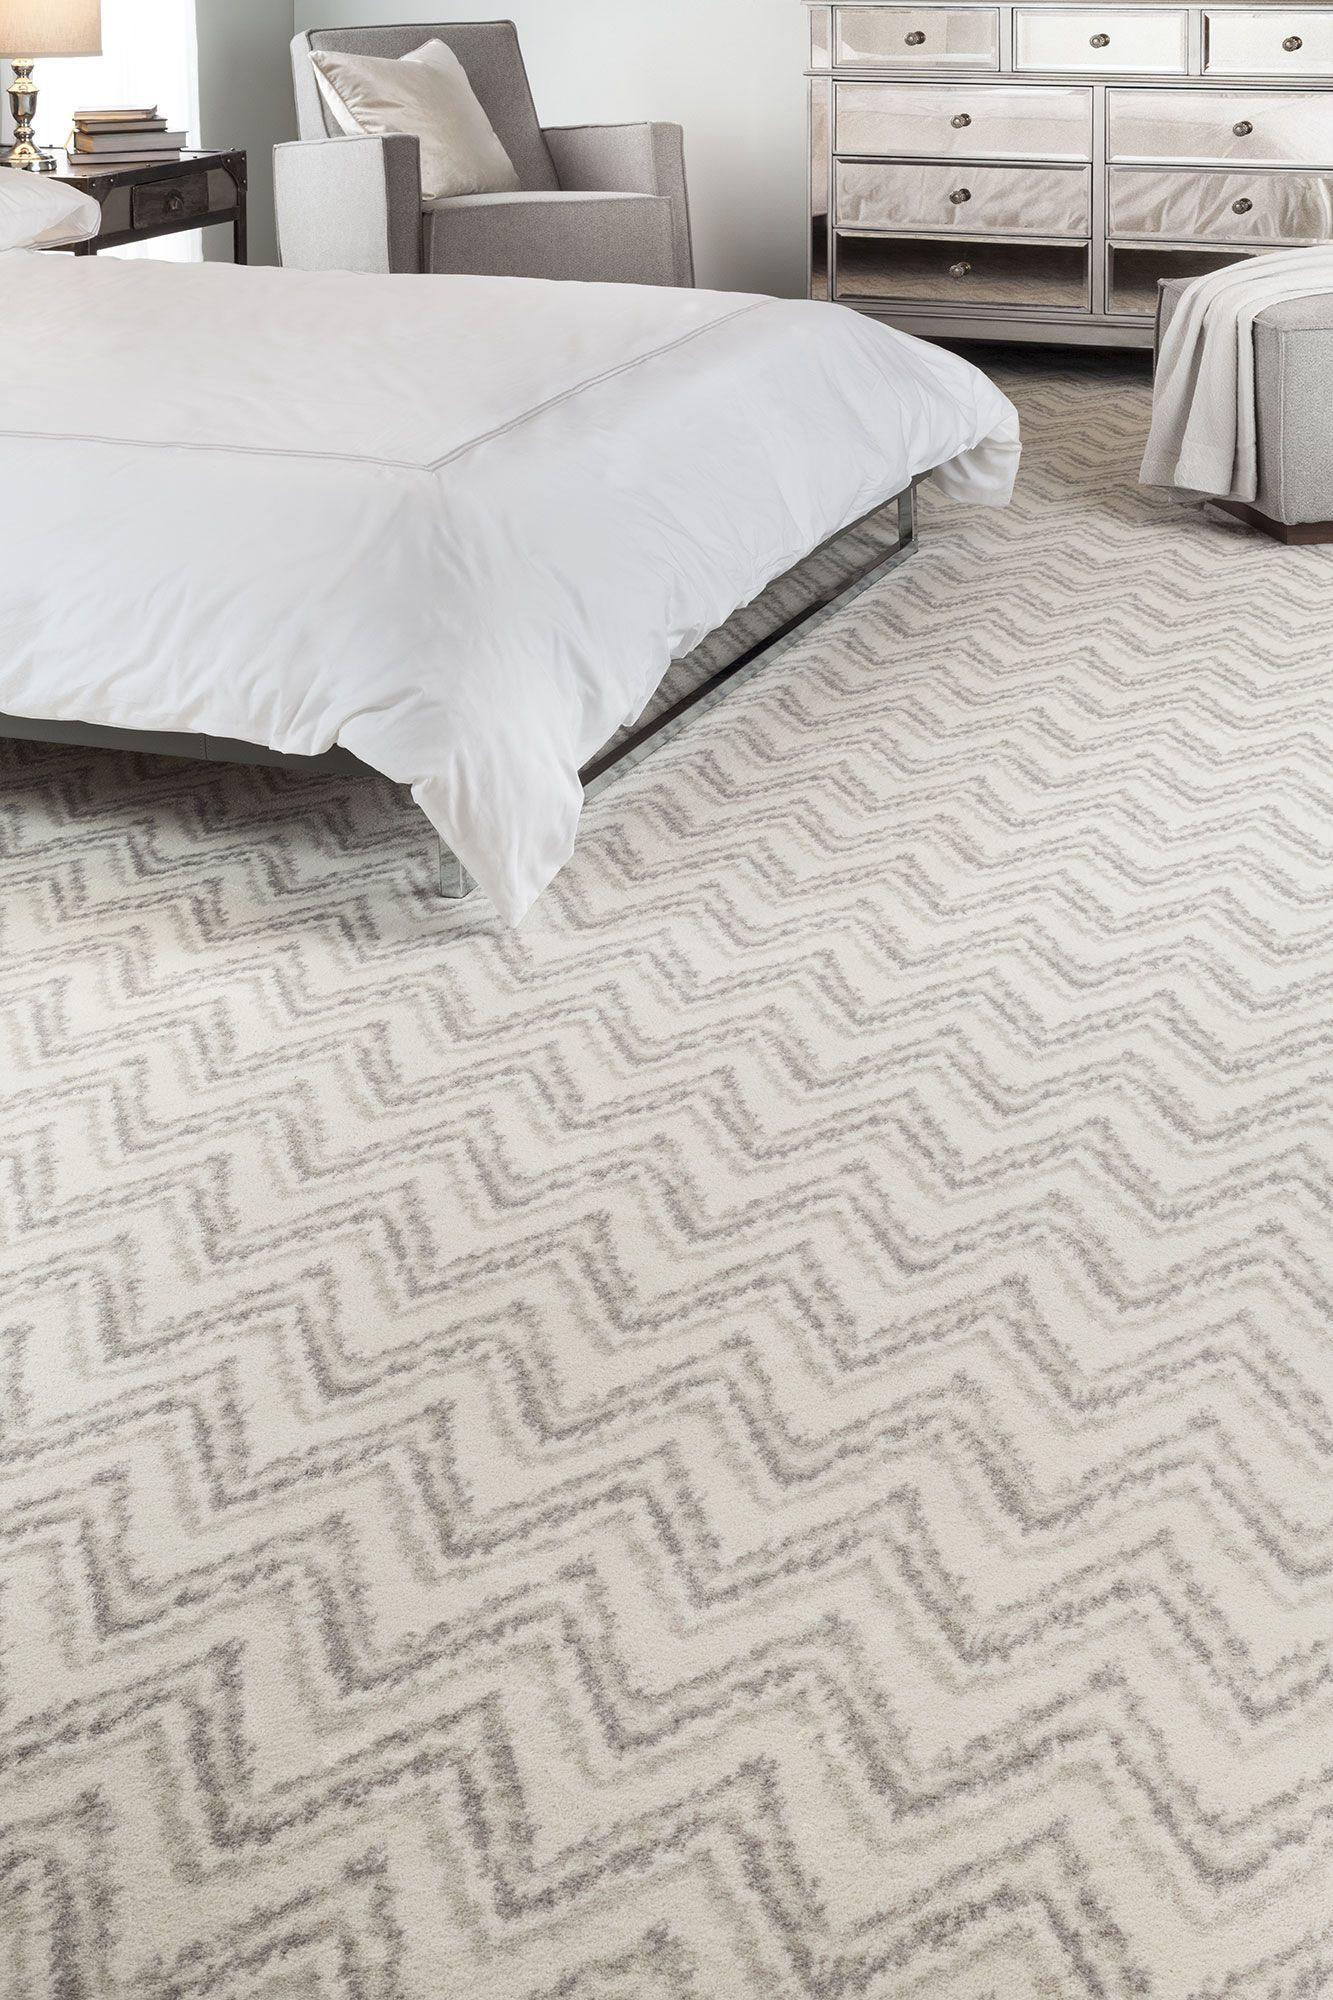 Chevron Patterned Carpet Gray Cream Bedroom Inspiration Runner Area Rug Ideas